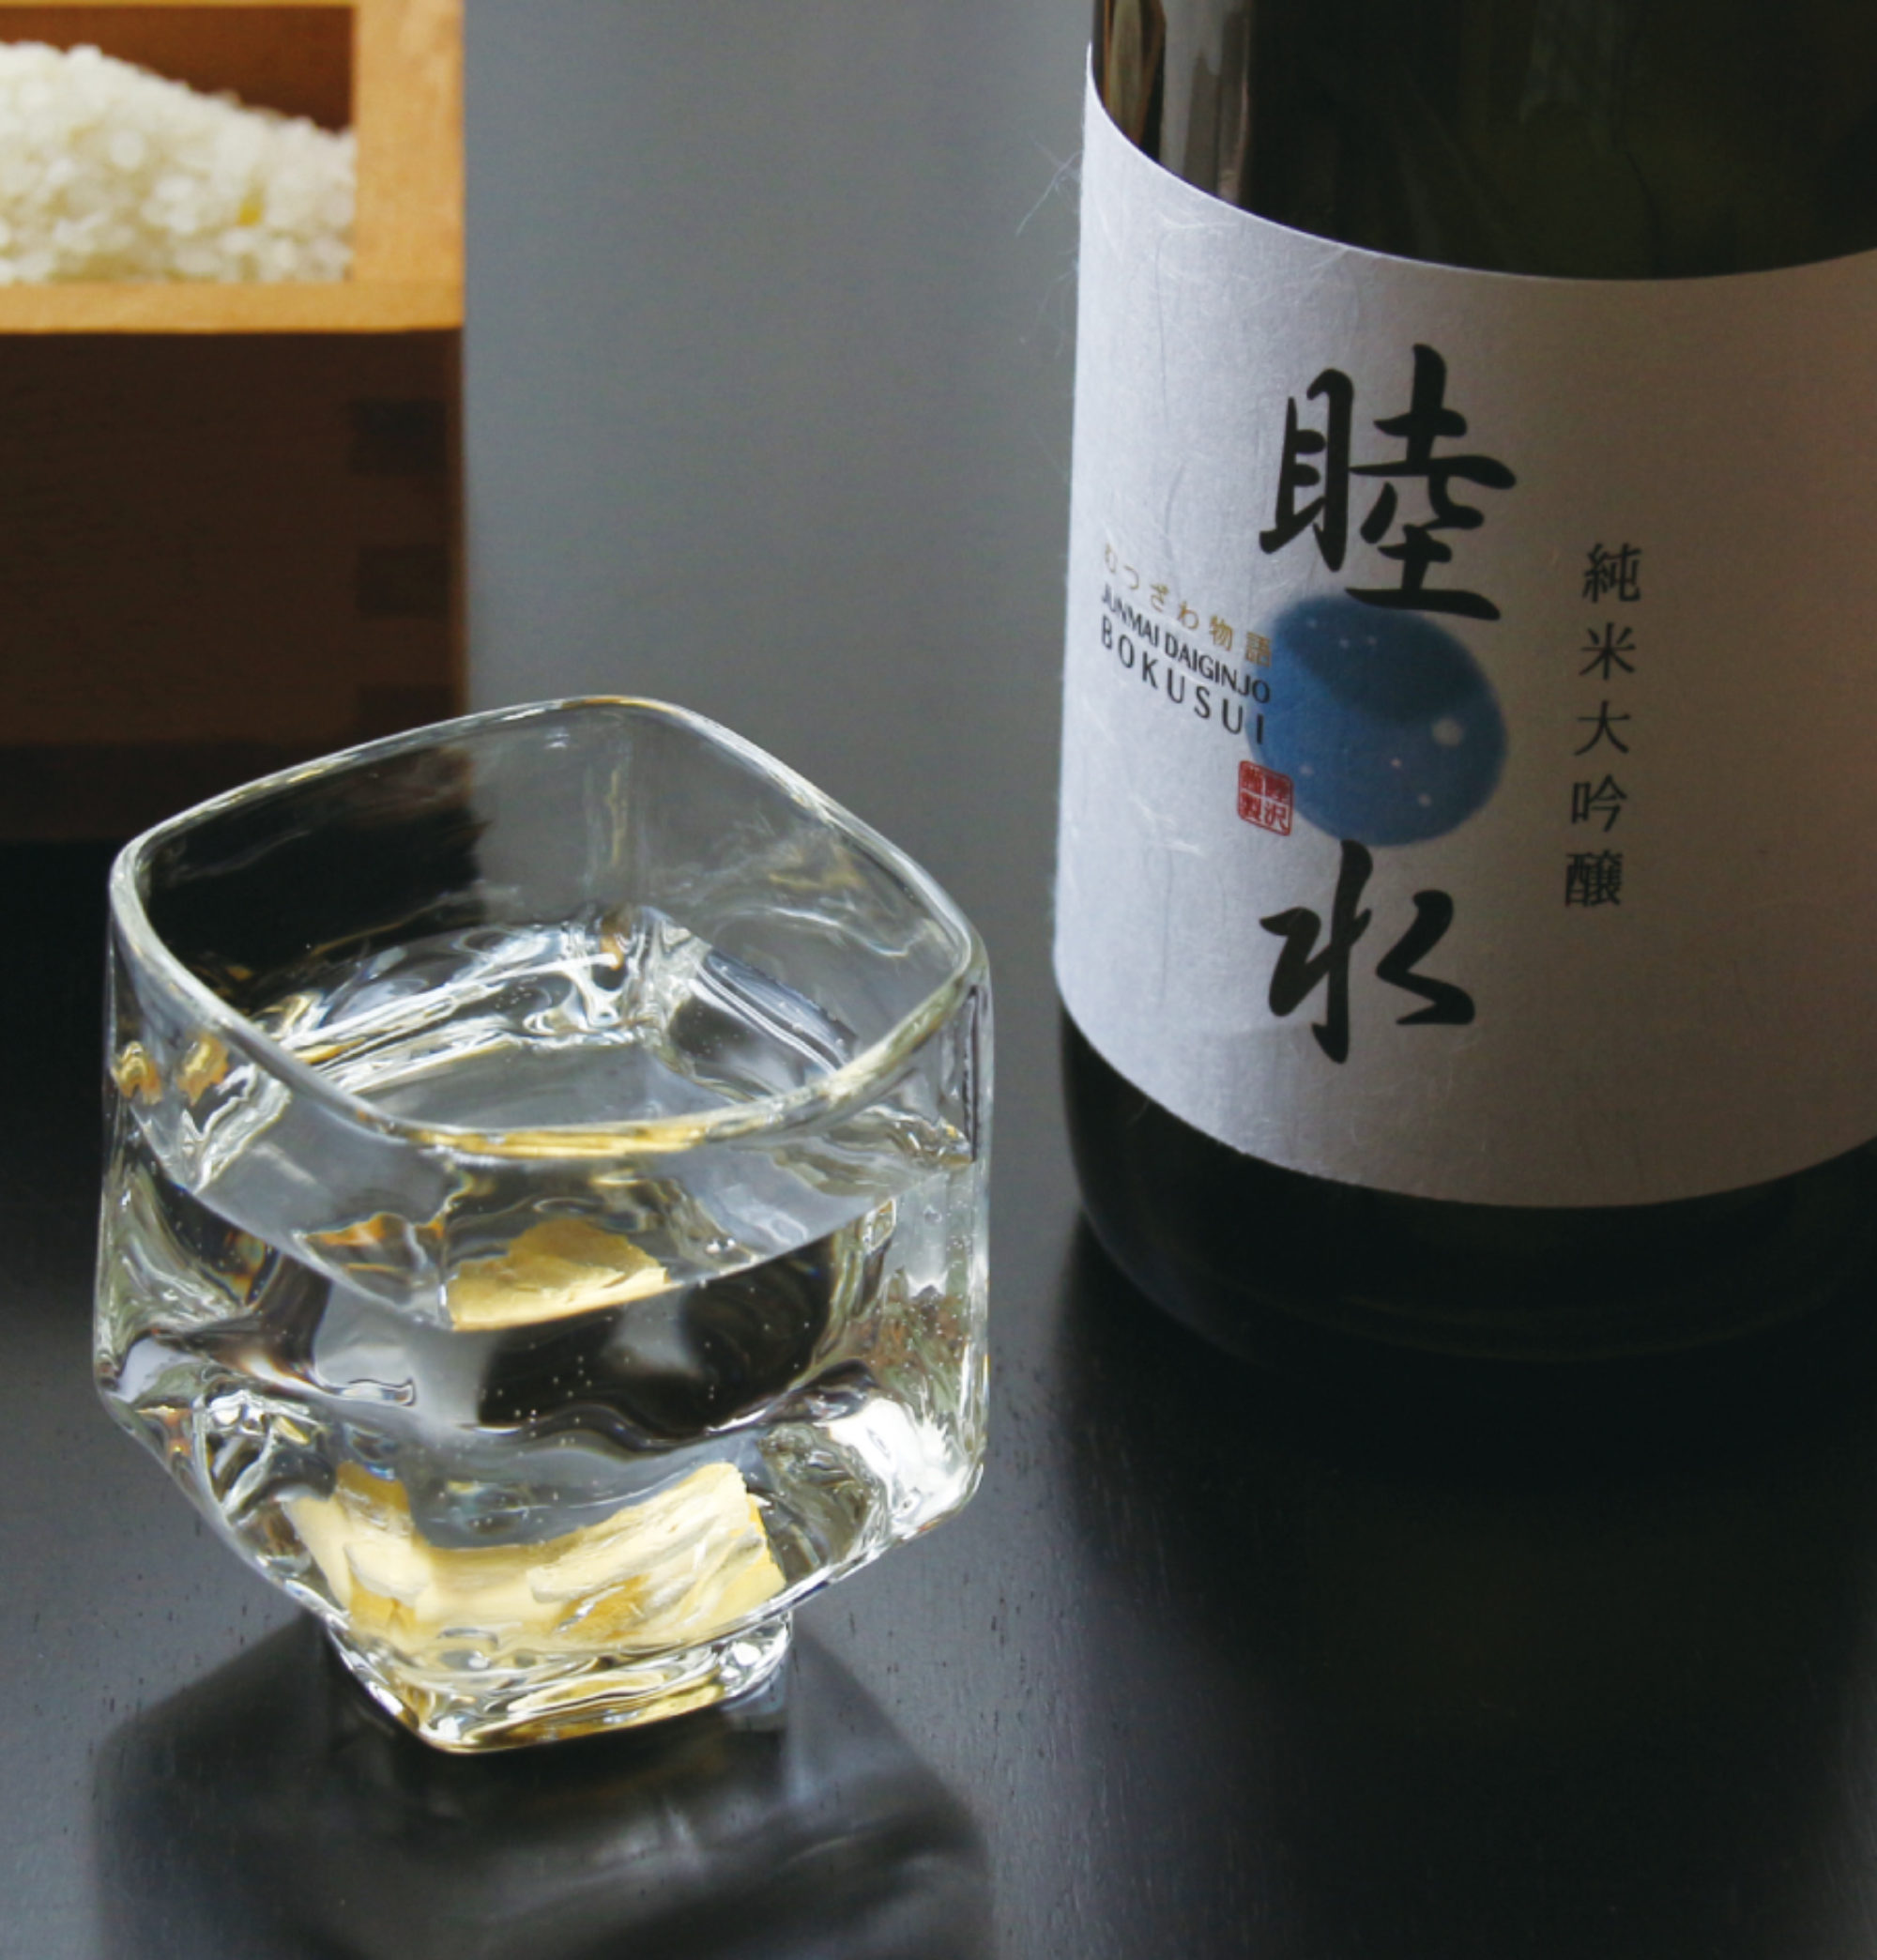 千葉県睦沢町の特産品 | mutsuzawa,chiba